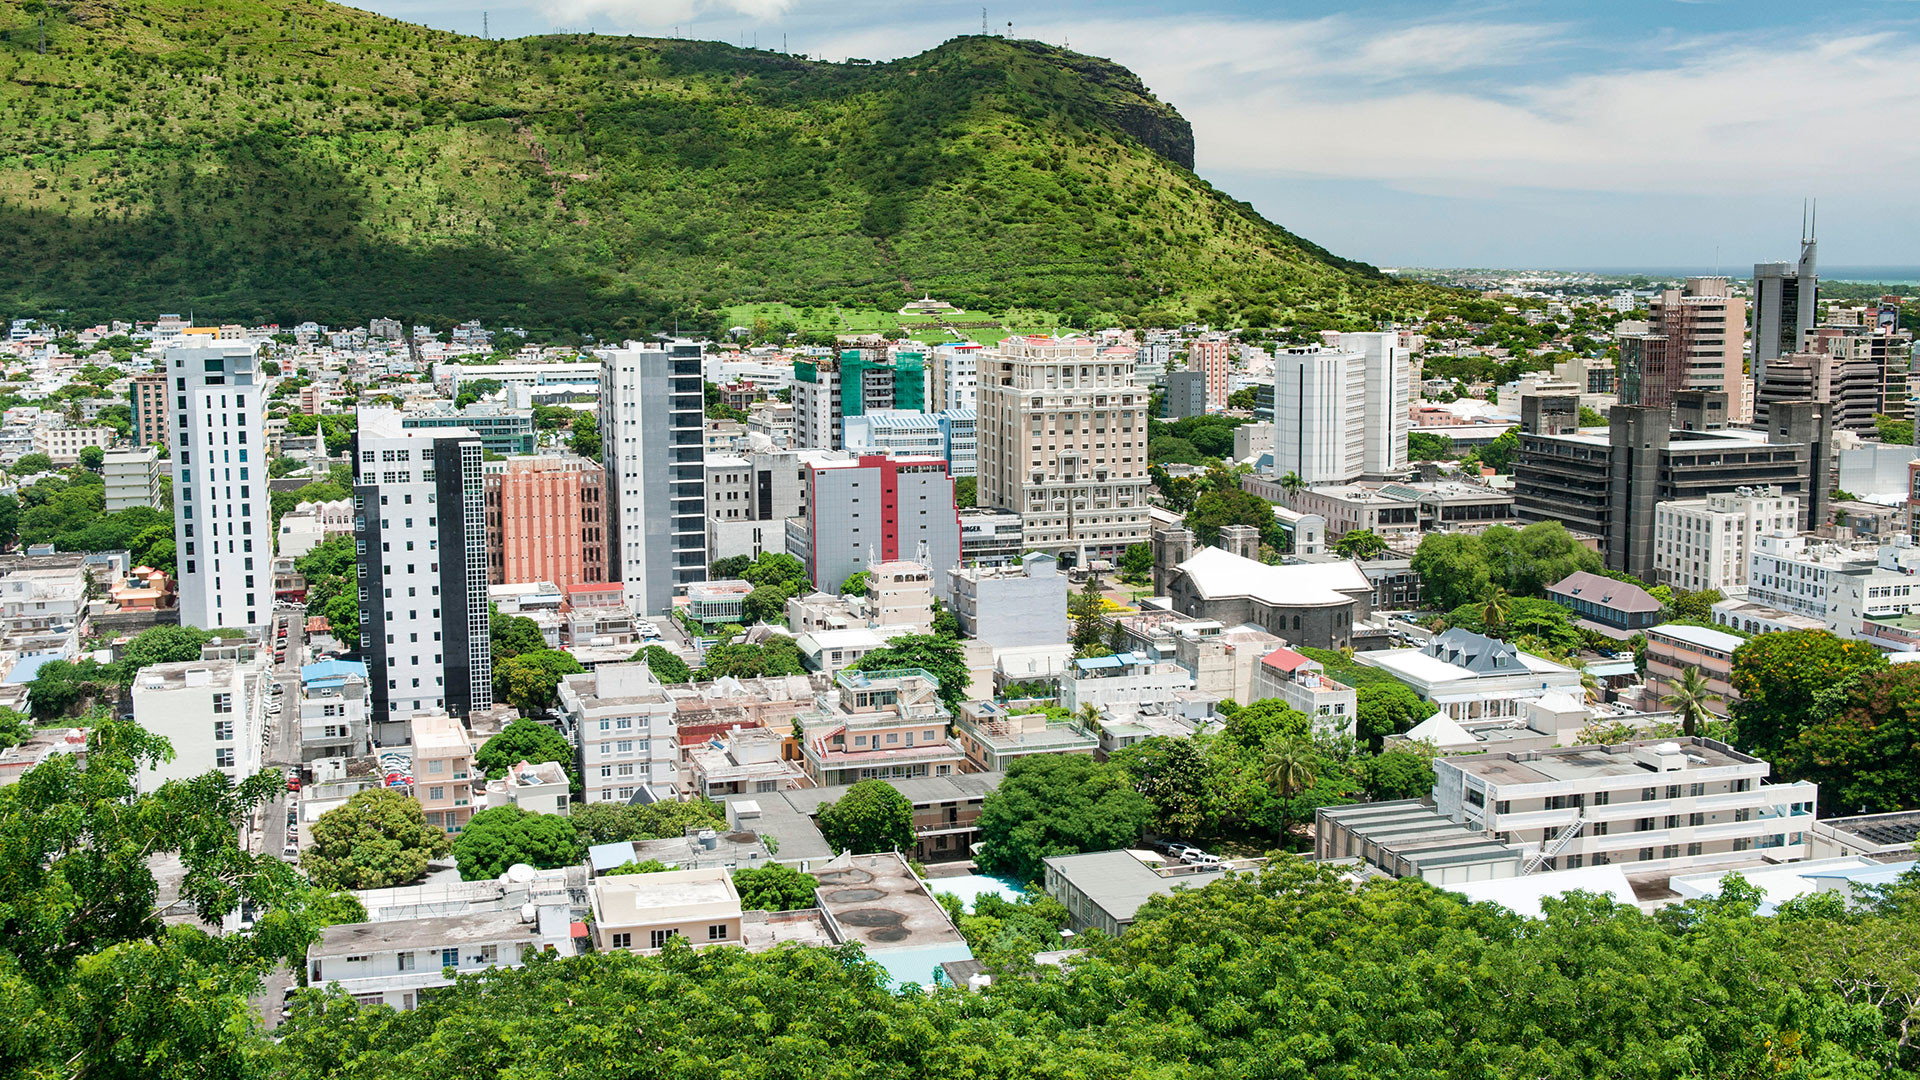 Port Louis, capital of Mauritius